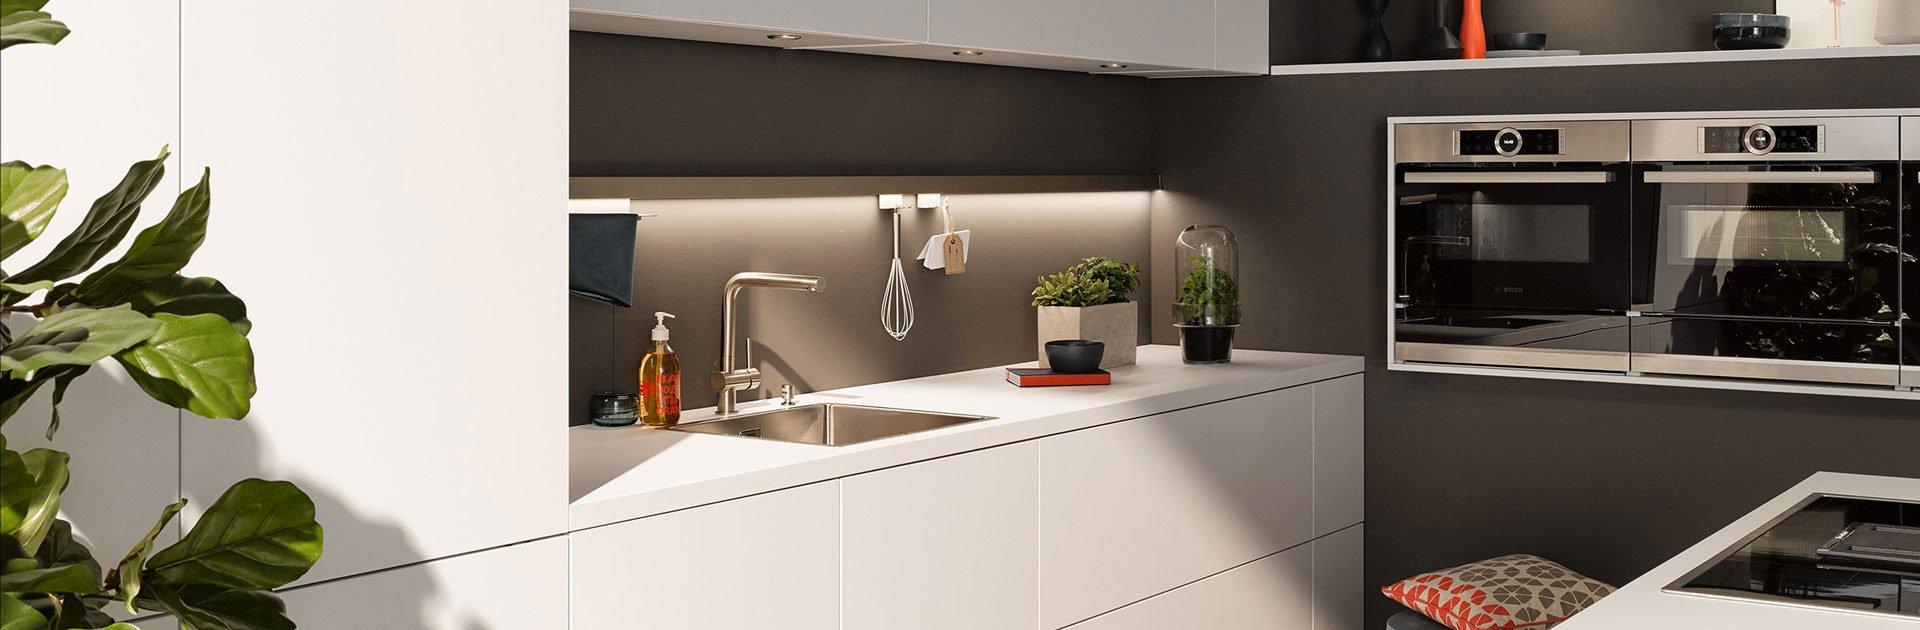 Witte keuken met gouden spoelbak | Satink Keukens